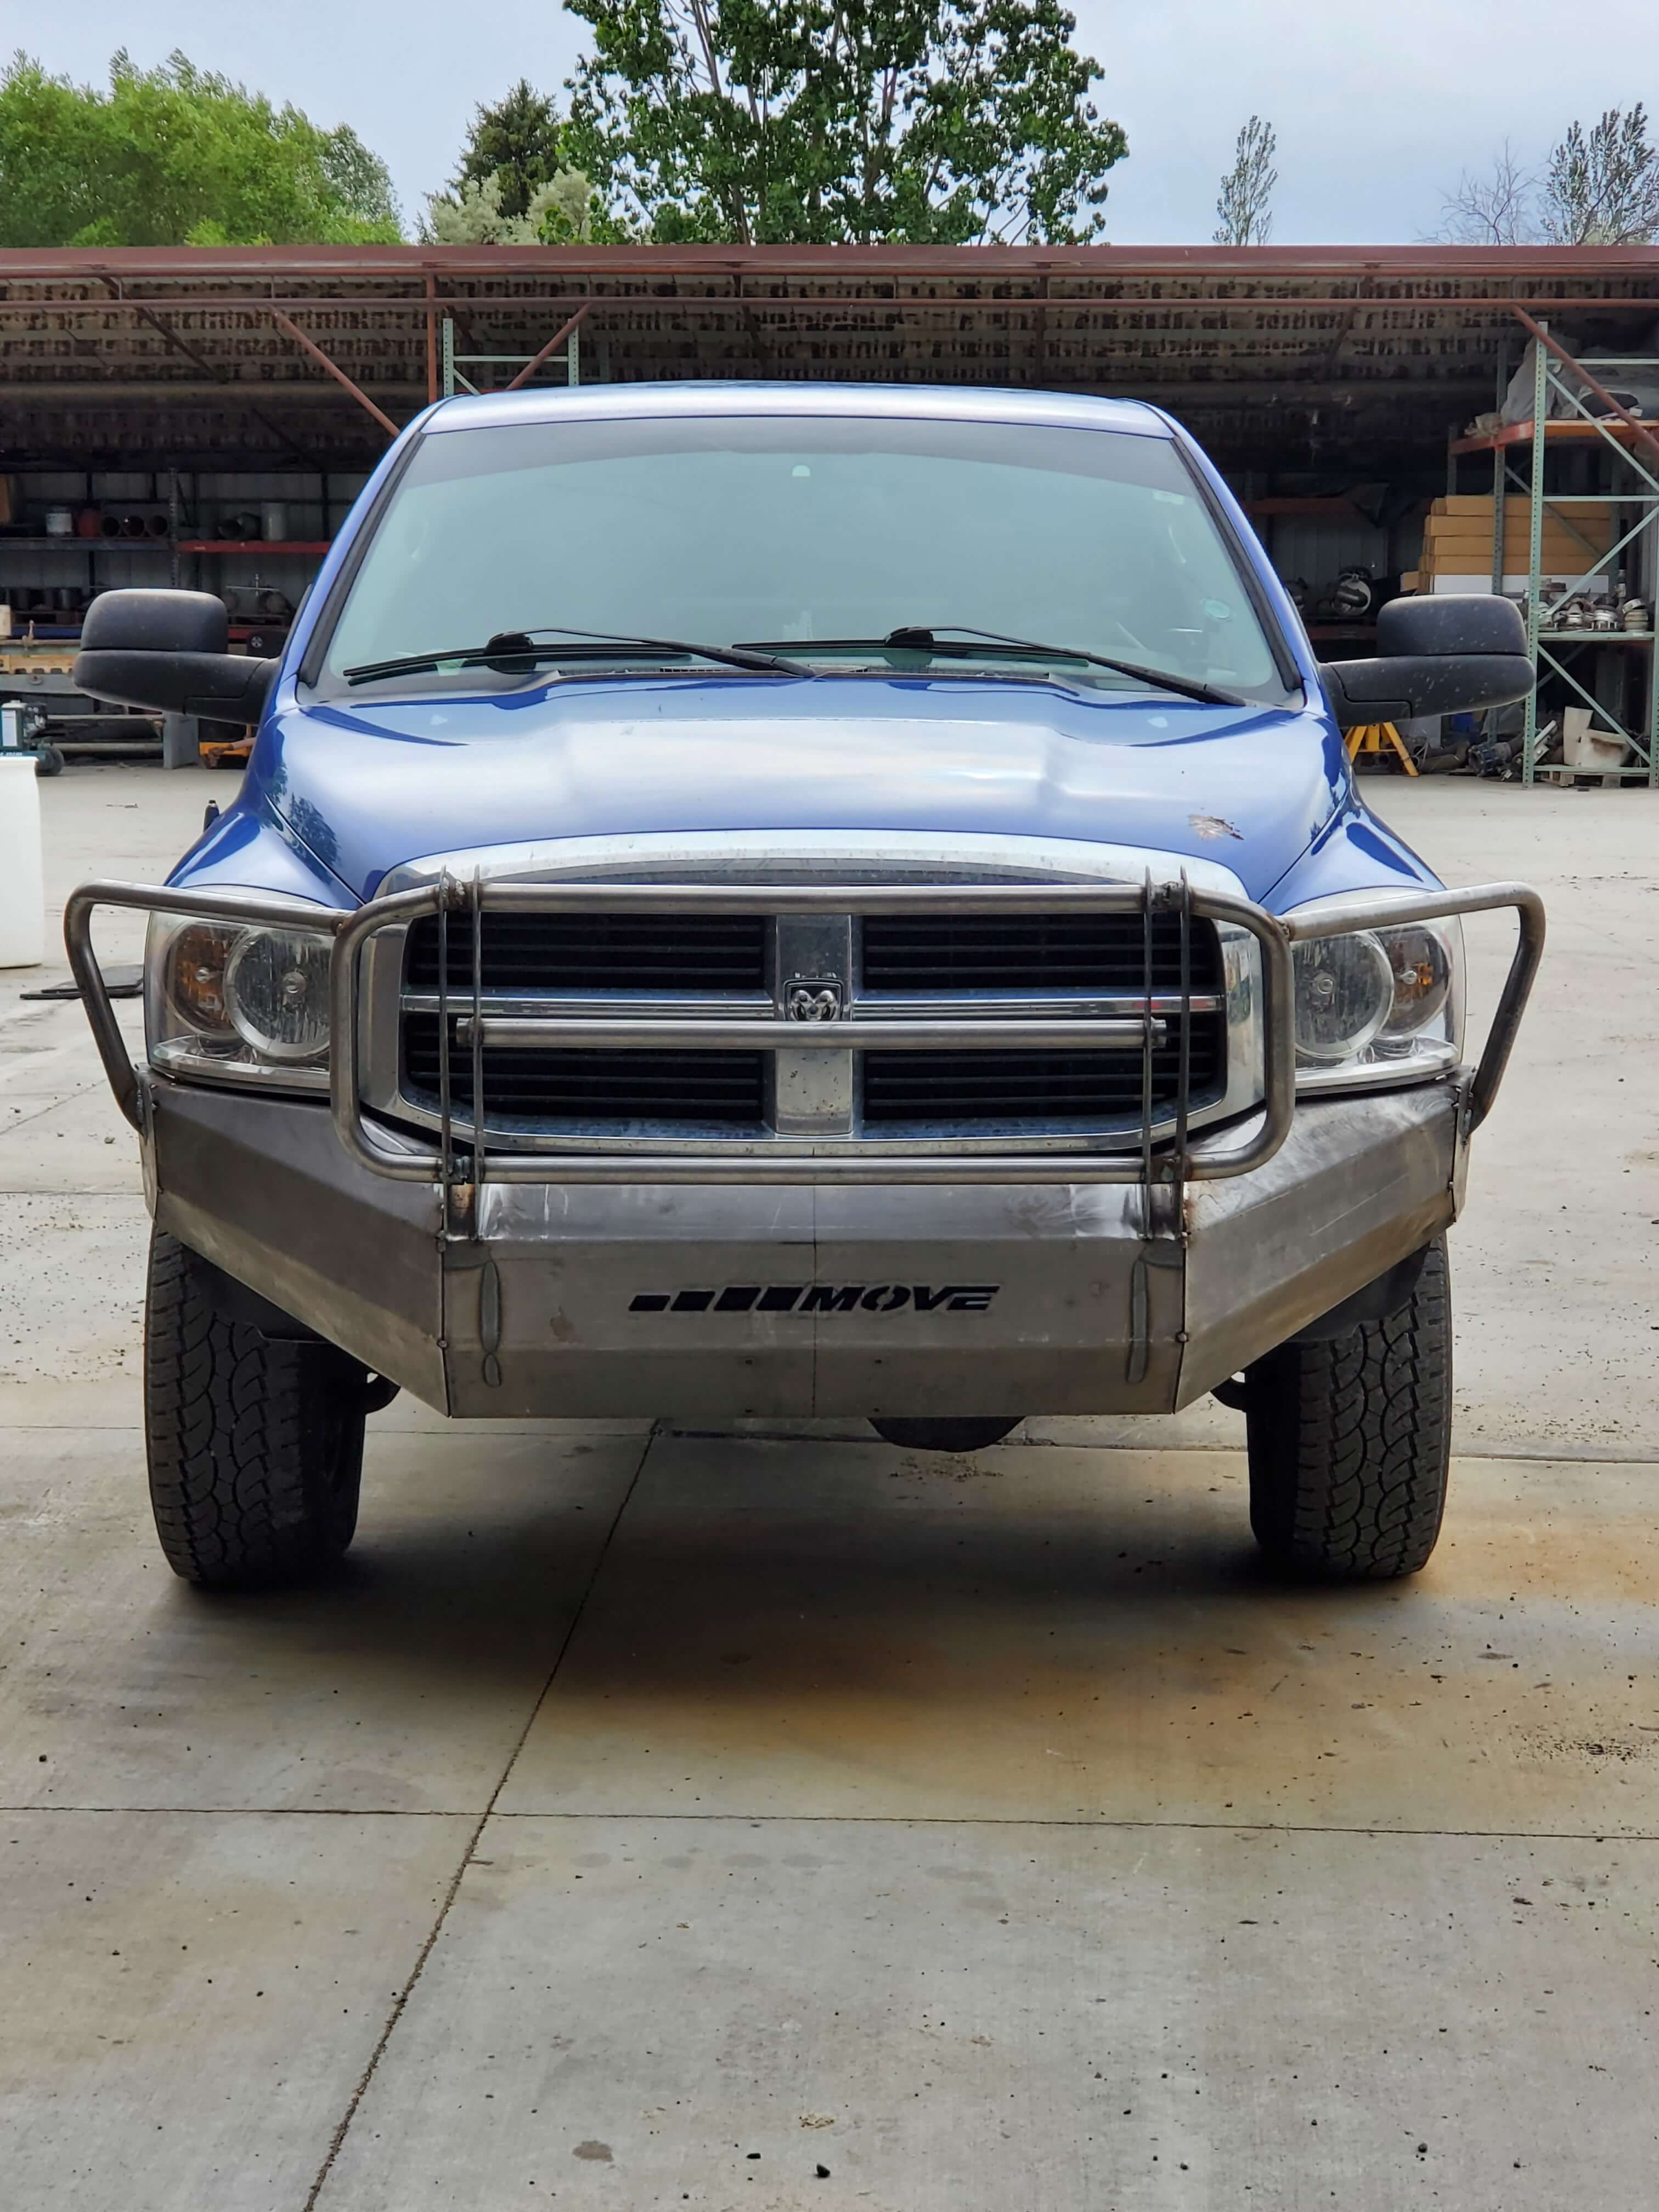 2001 Dodge Ram 2500 Front Bumper : dodge, front, bumper, Heavy, Truck, Bumpers